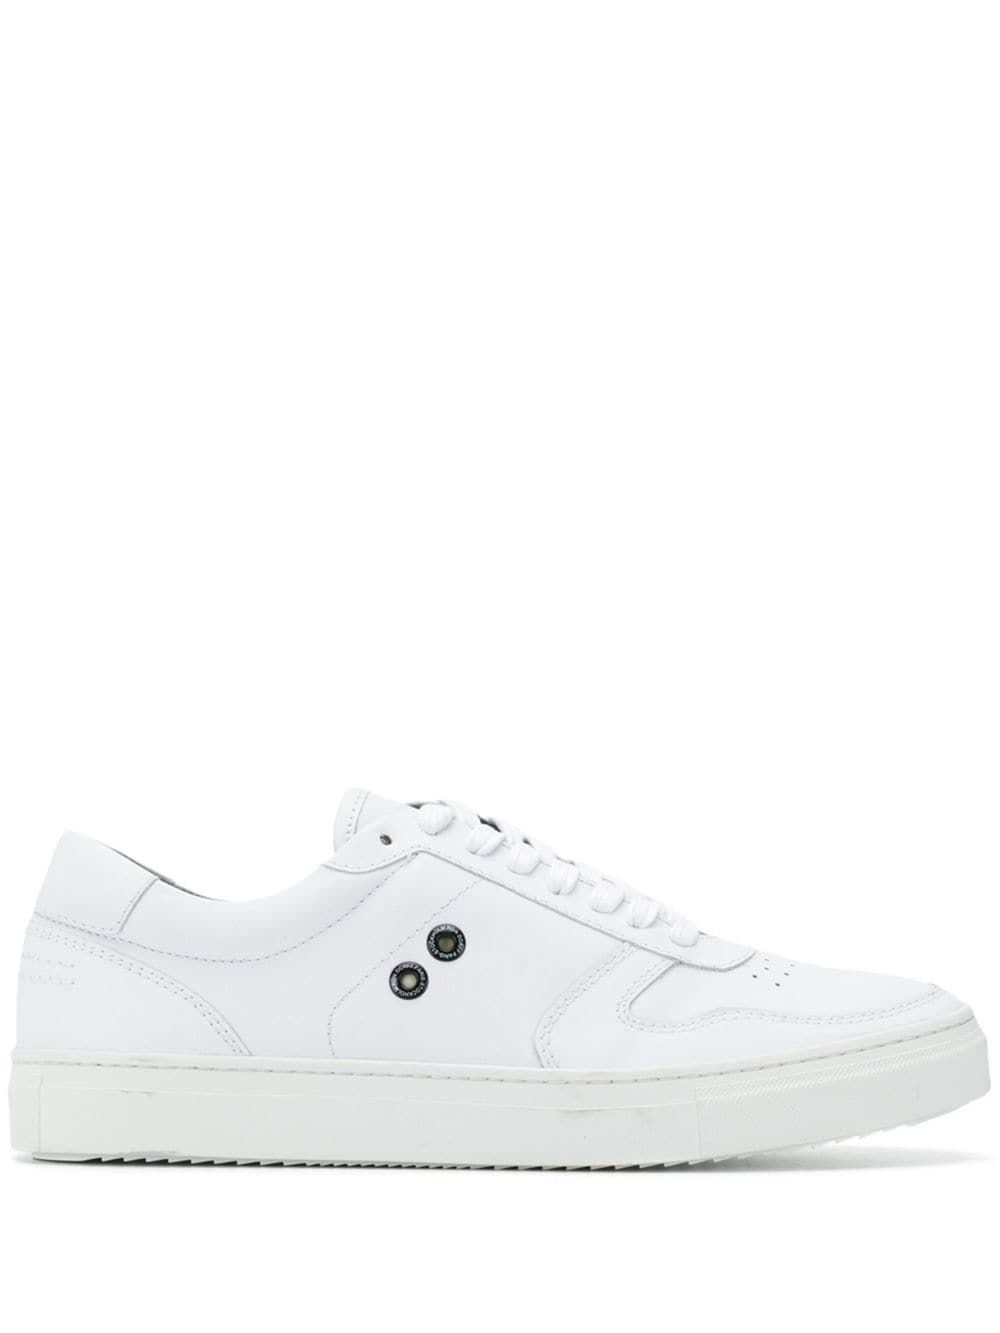 outlet store 00b11 32c8f RON DORFF RON DORFF URBAN TENNIS SNEAKERS - WHITE.  rondorff  shoes